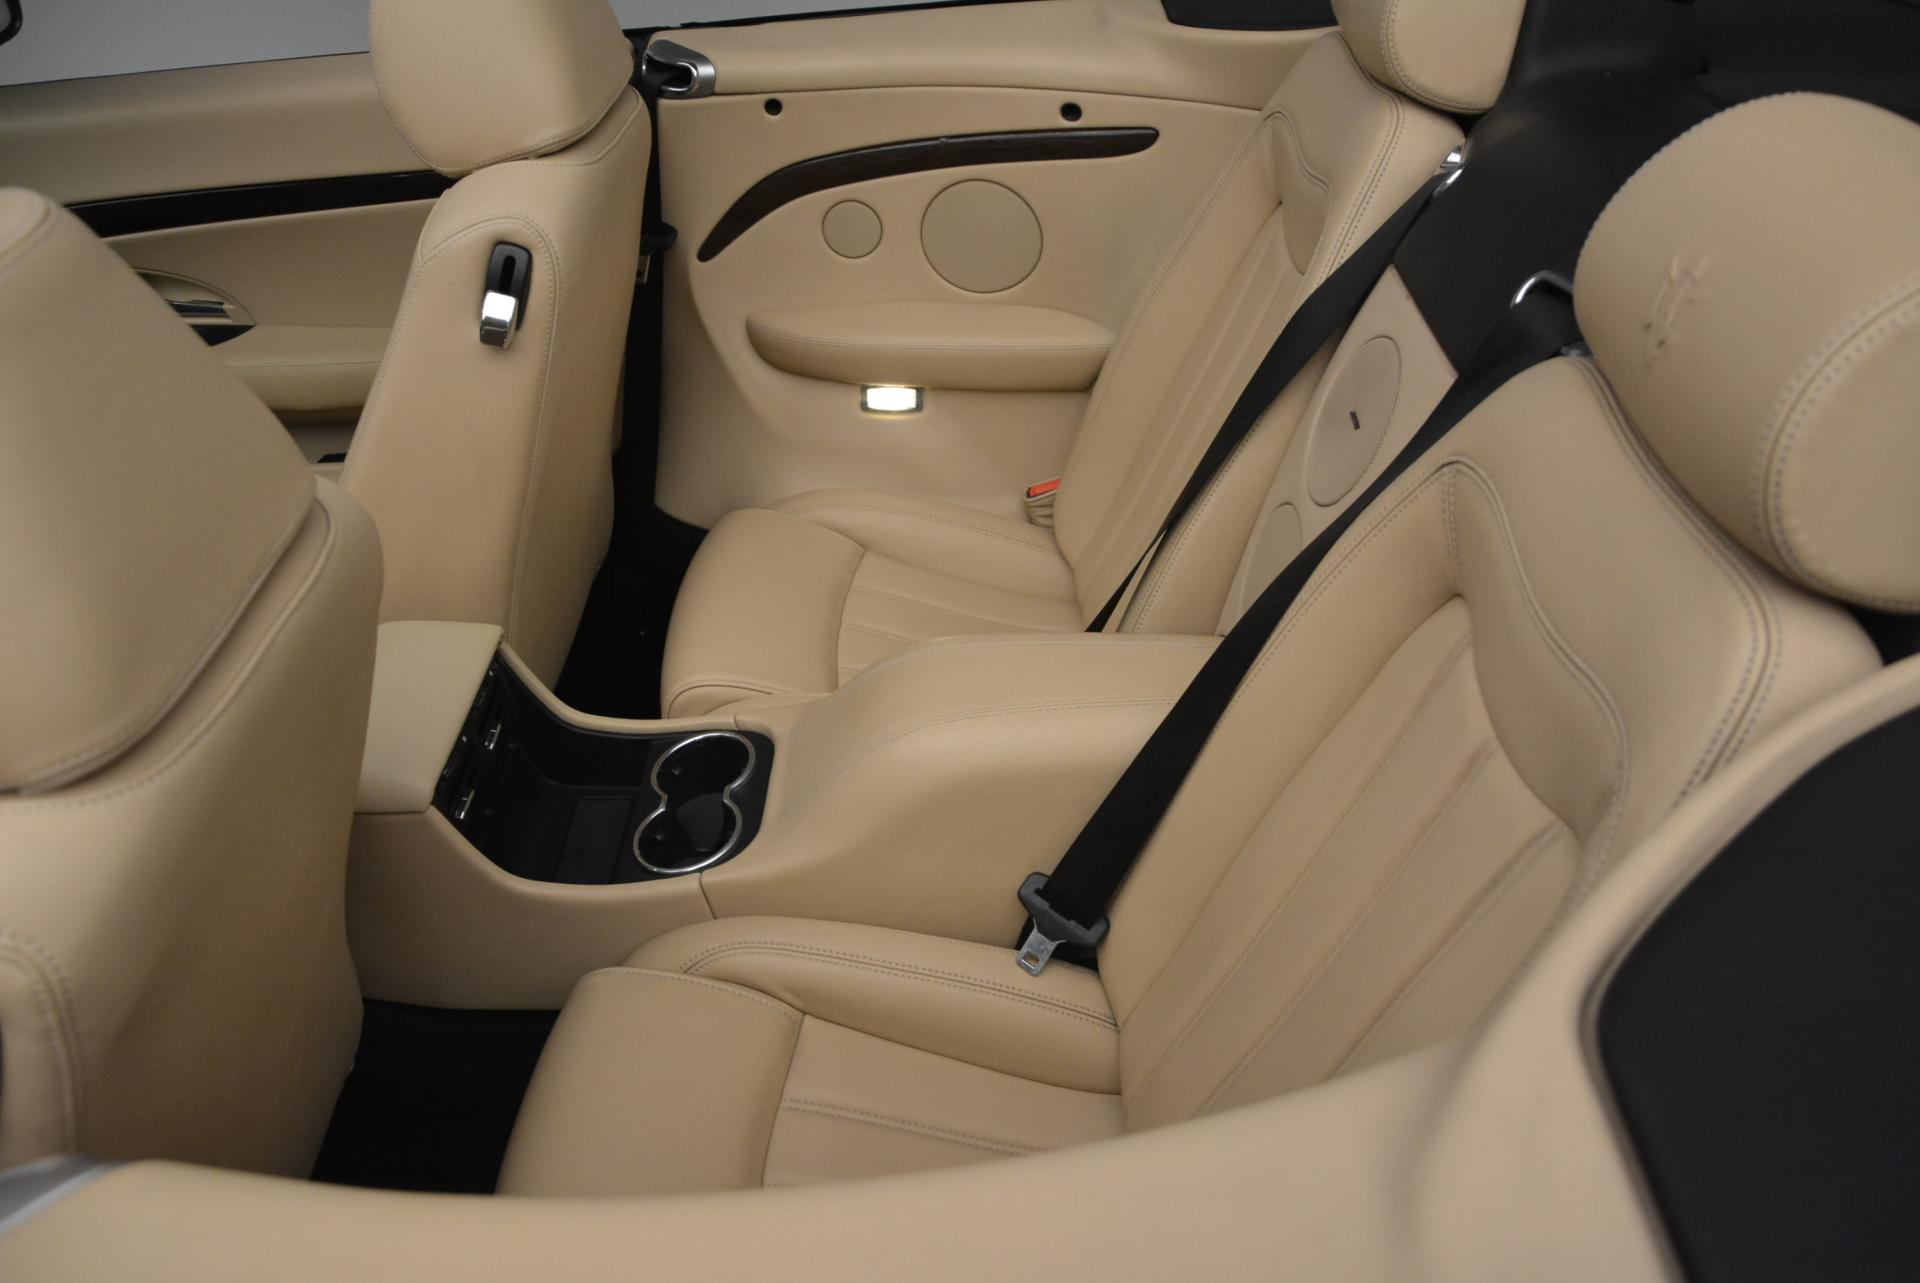 Used 2011 Maserati GranTurismo Base For Sale In Westport, CT 158_p29